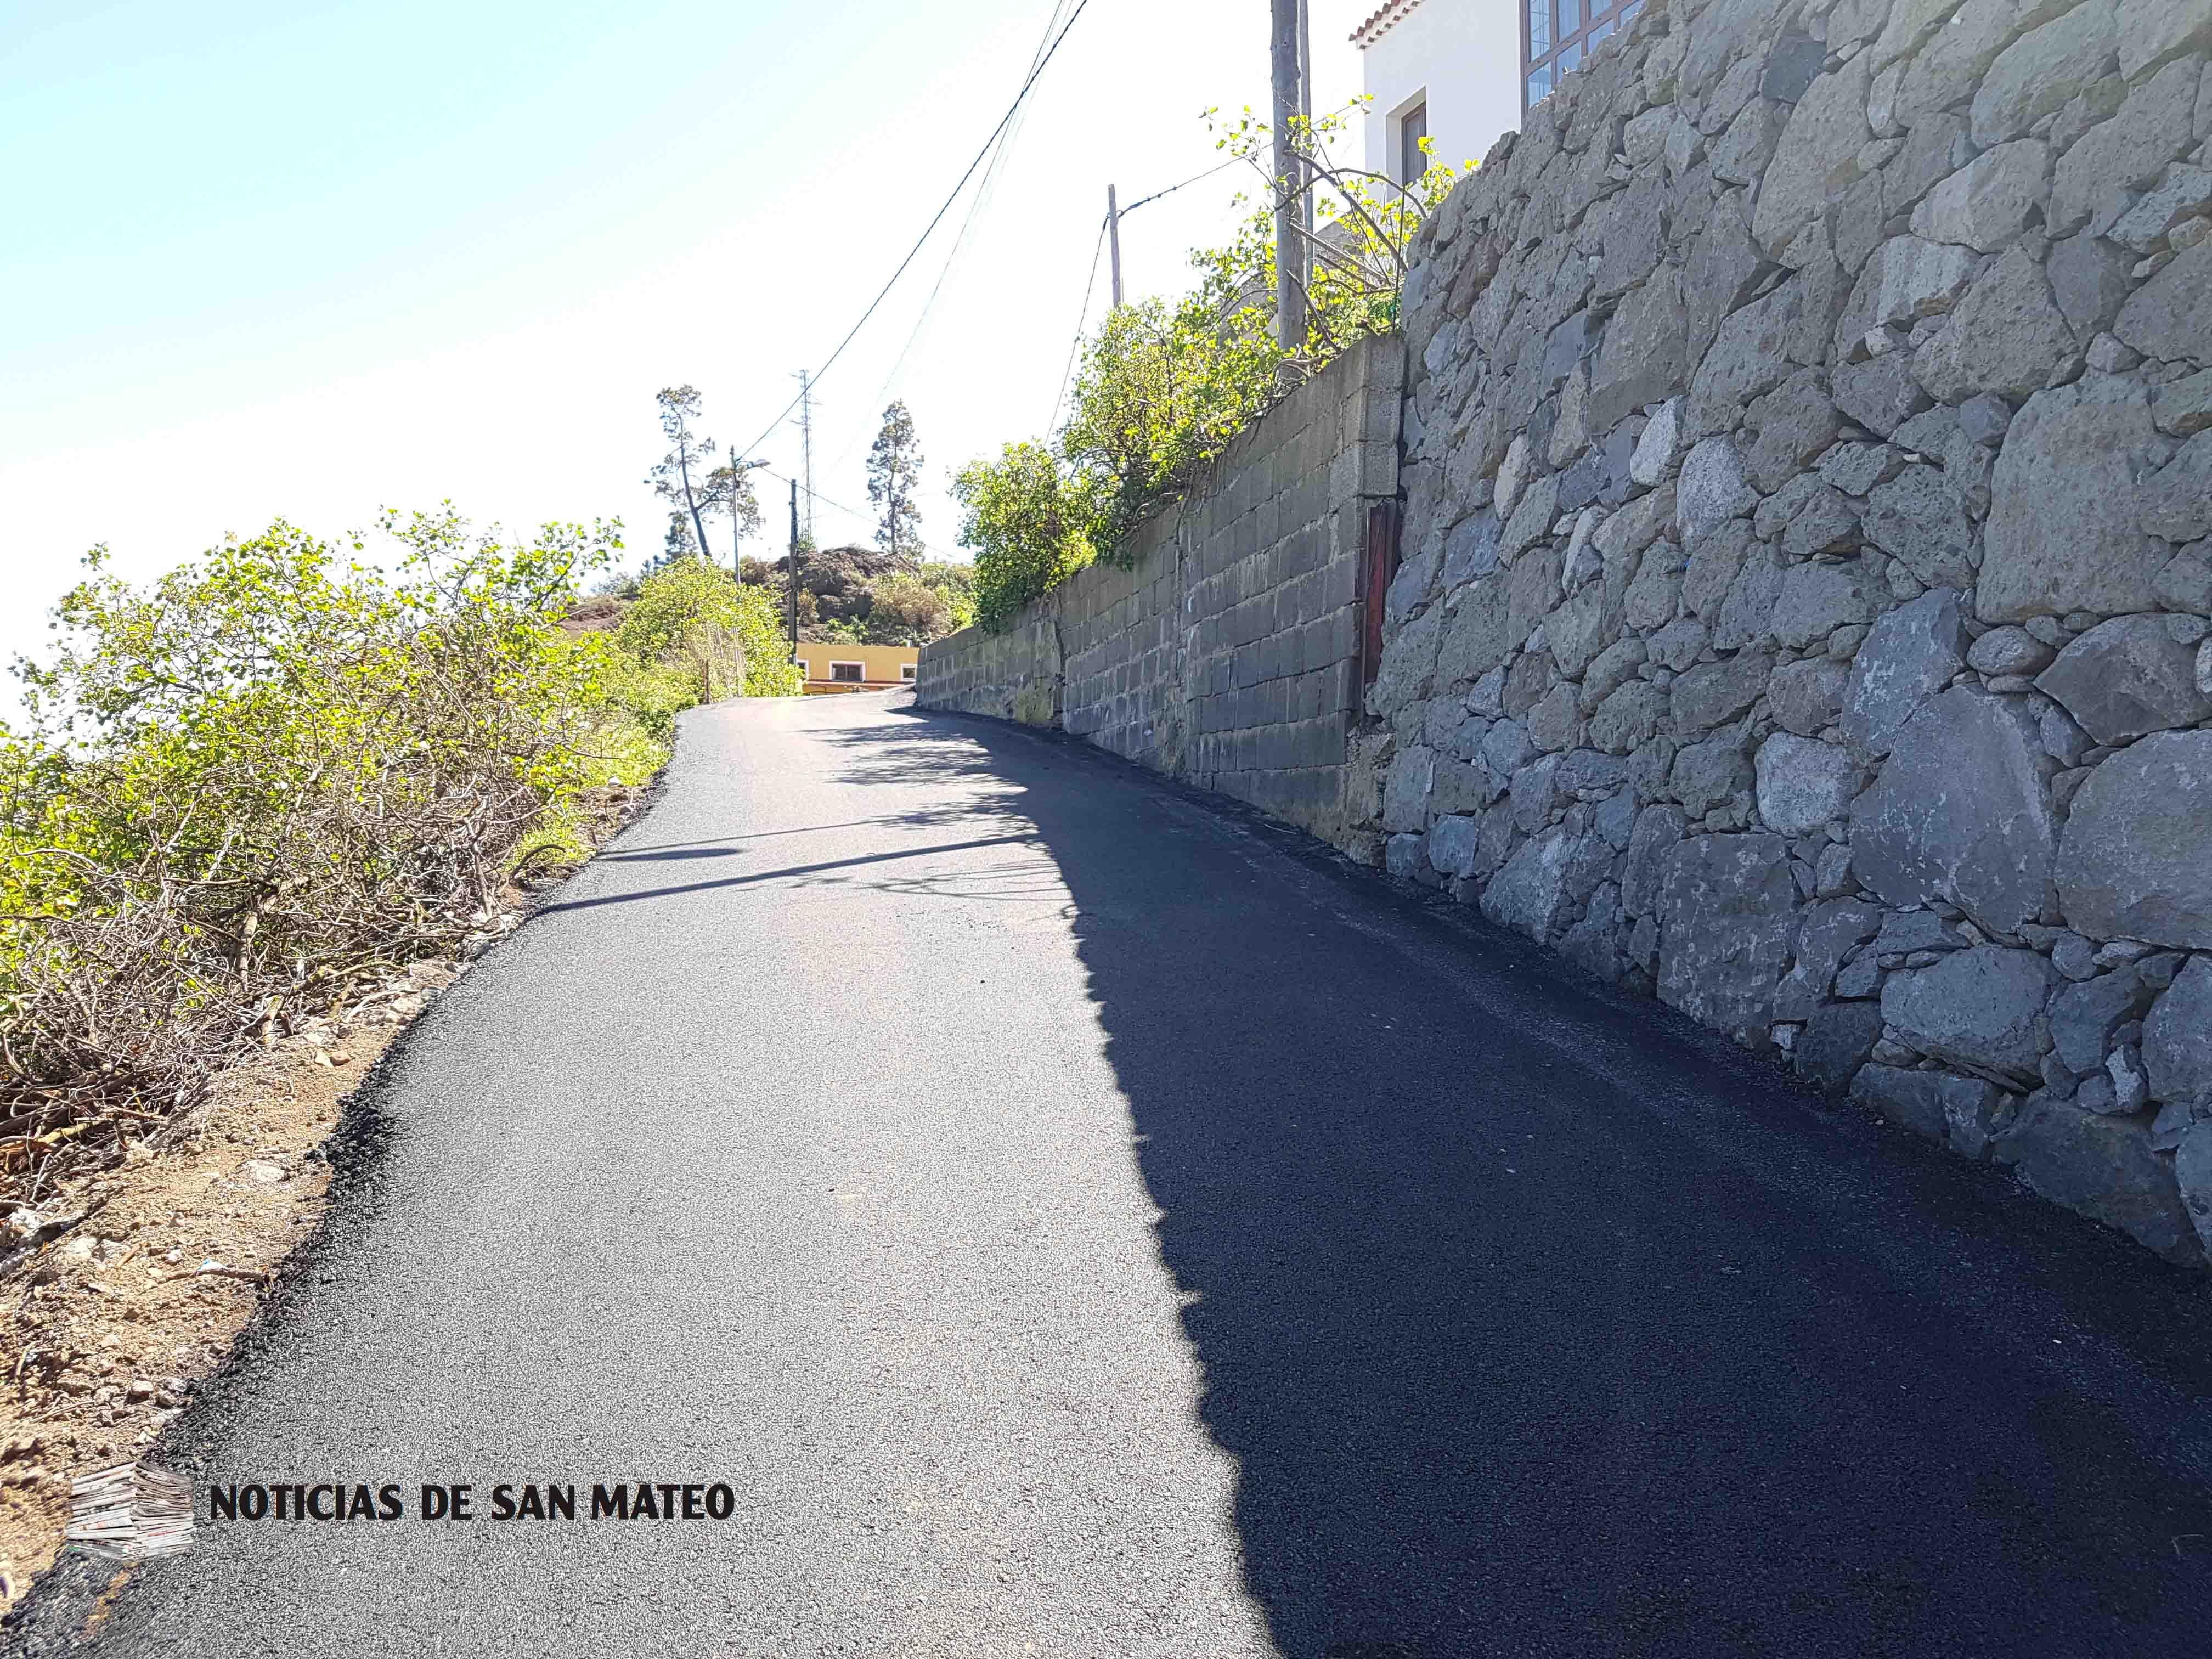 Muro y carretera La Montaneta San Mateo Noticias de San Mateo